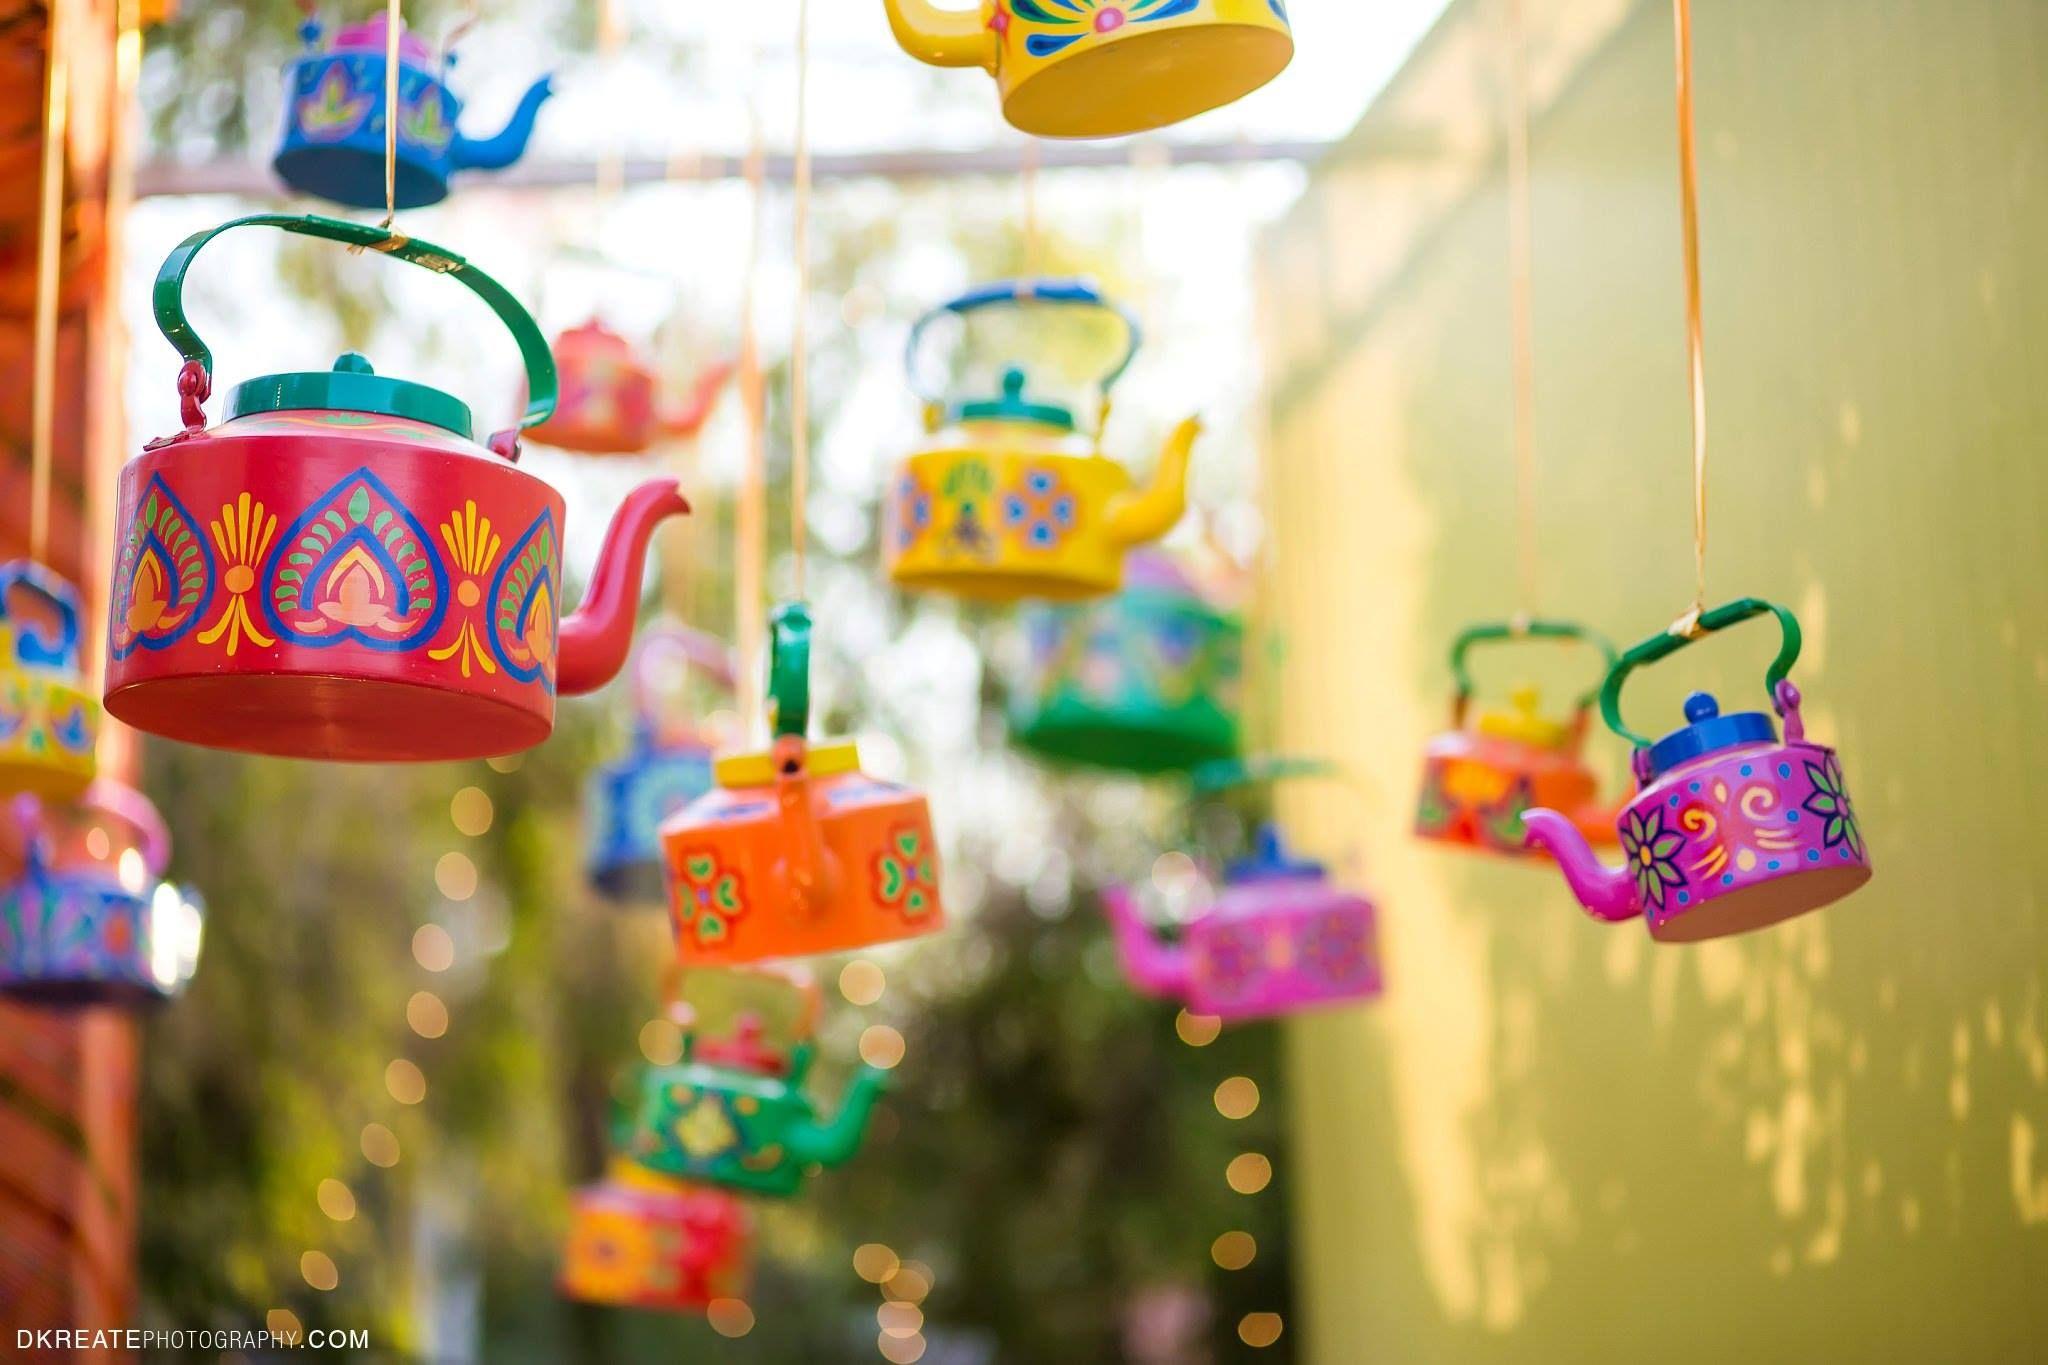 Mehndi Party Entertainment Ideas : Colorful photo booth ideas. painted tea kettle. diy decor for mehndi